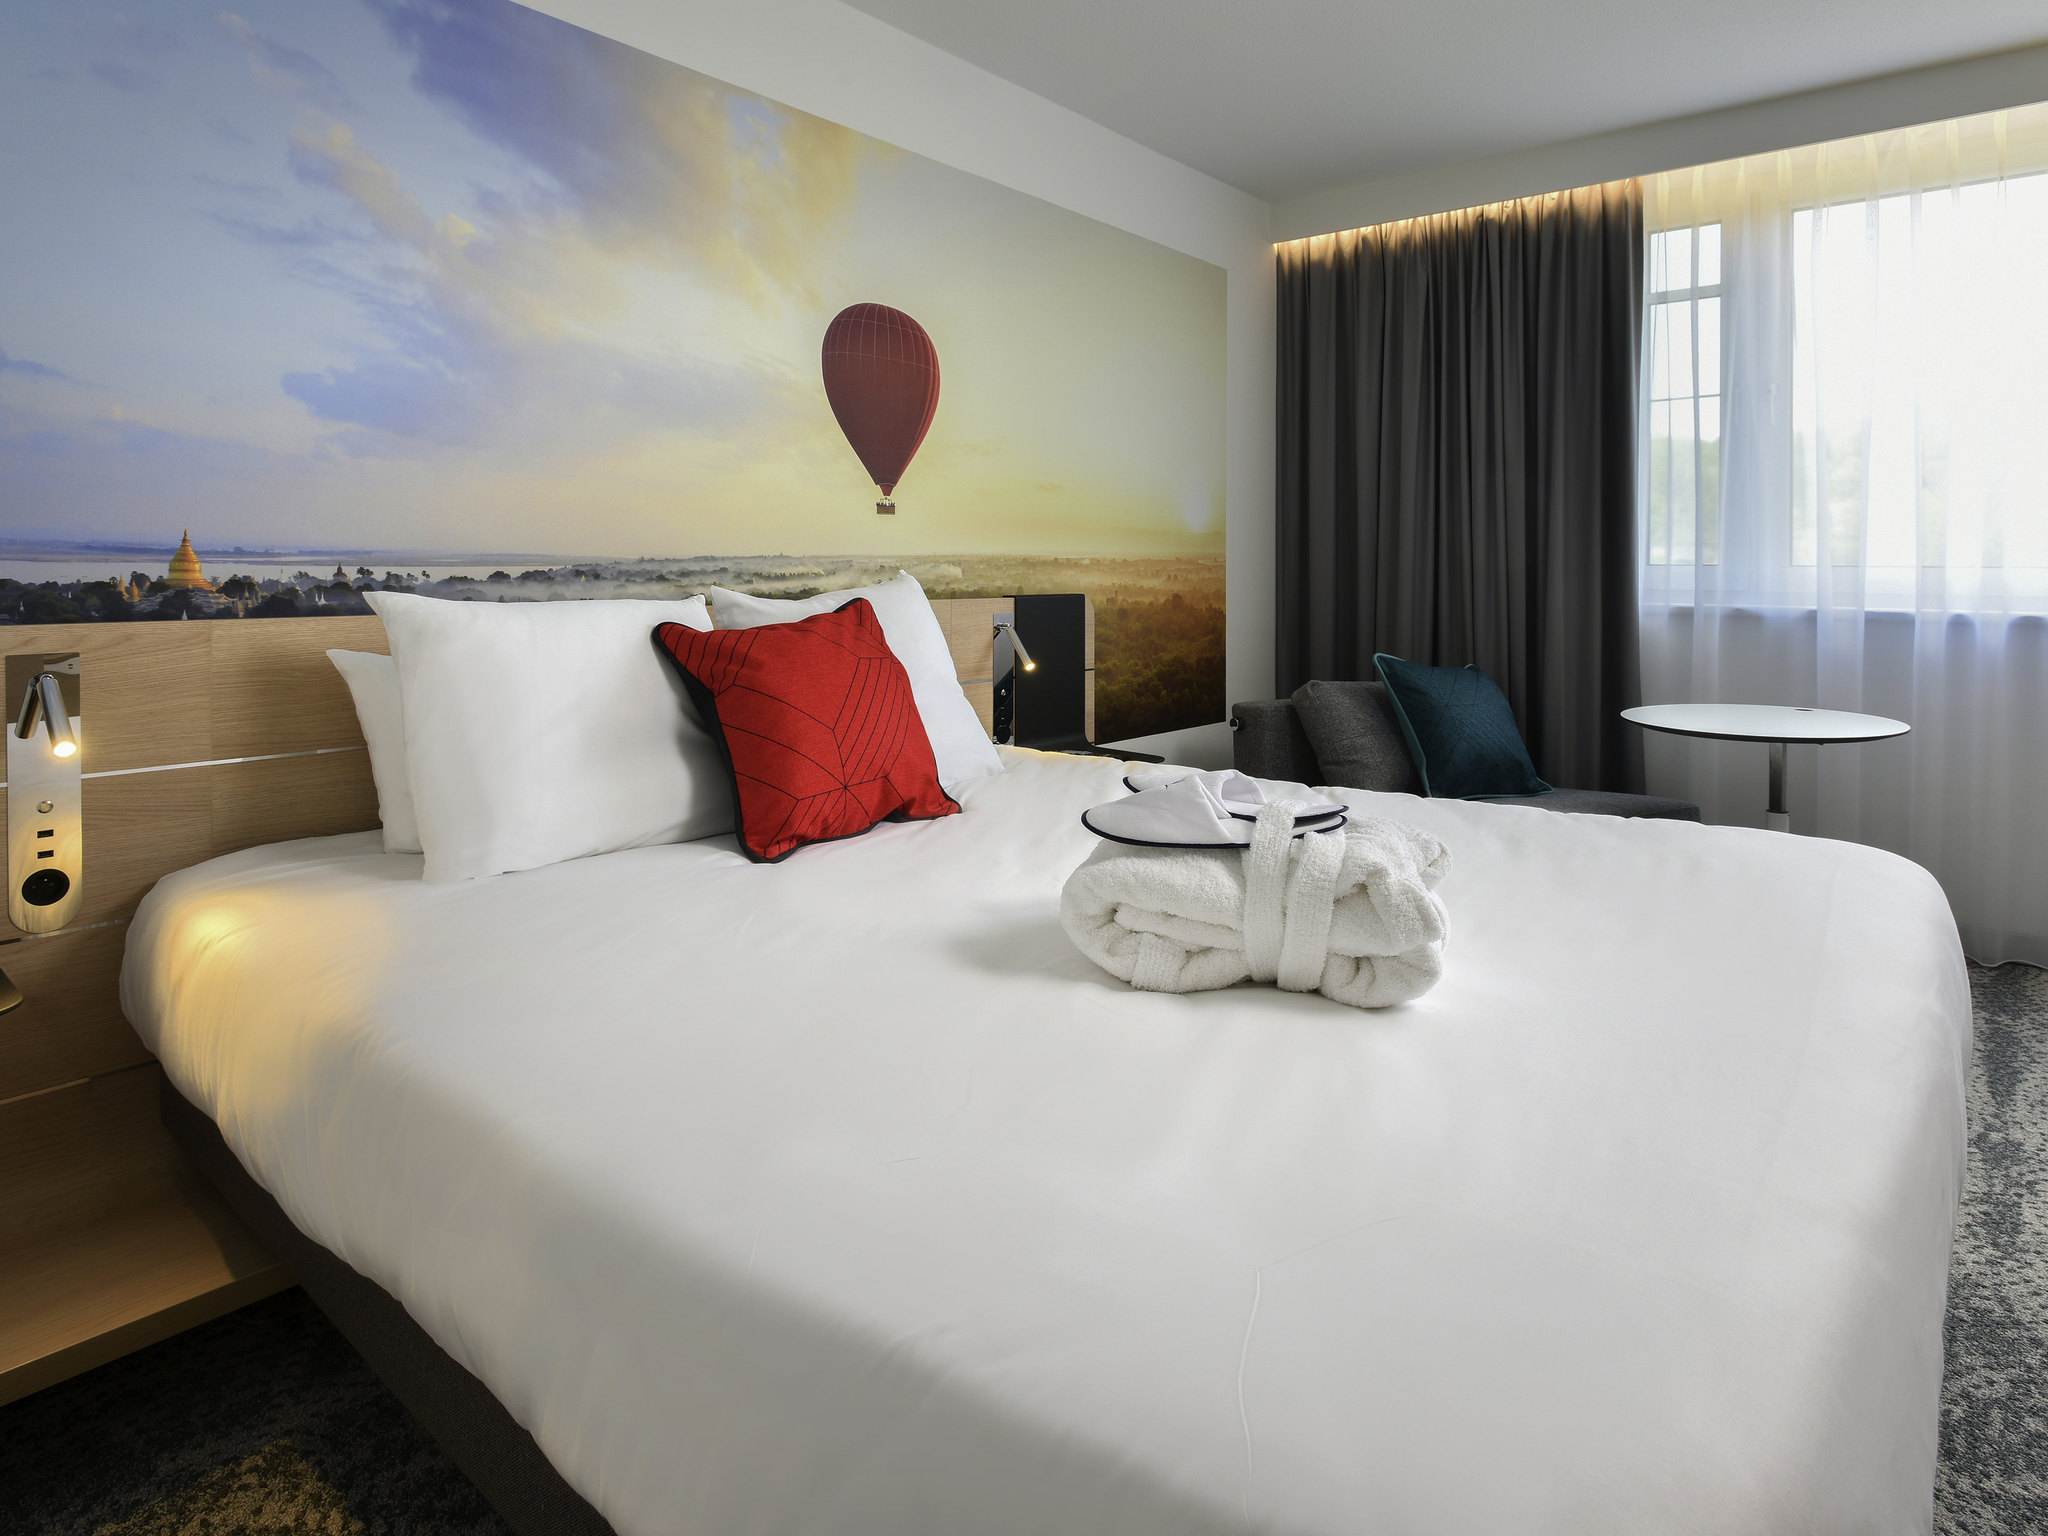 Hotel – Novotel Wavre Brussels East